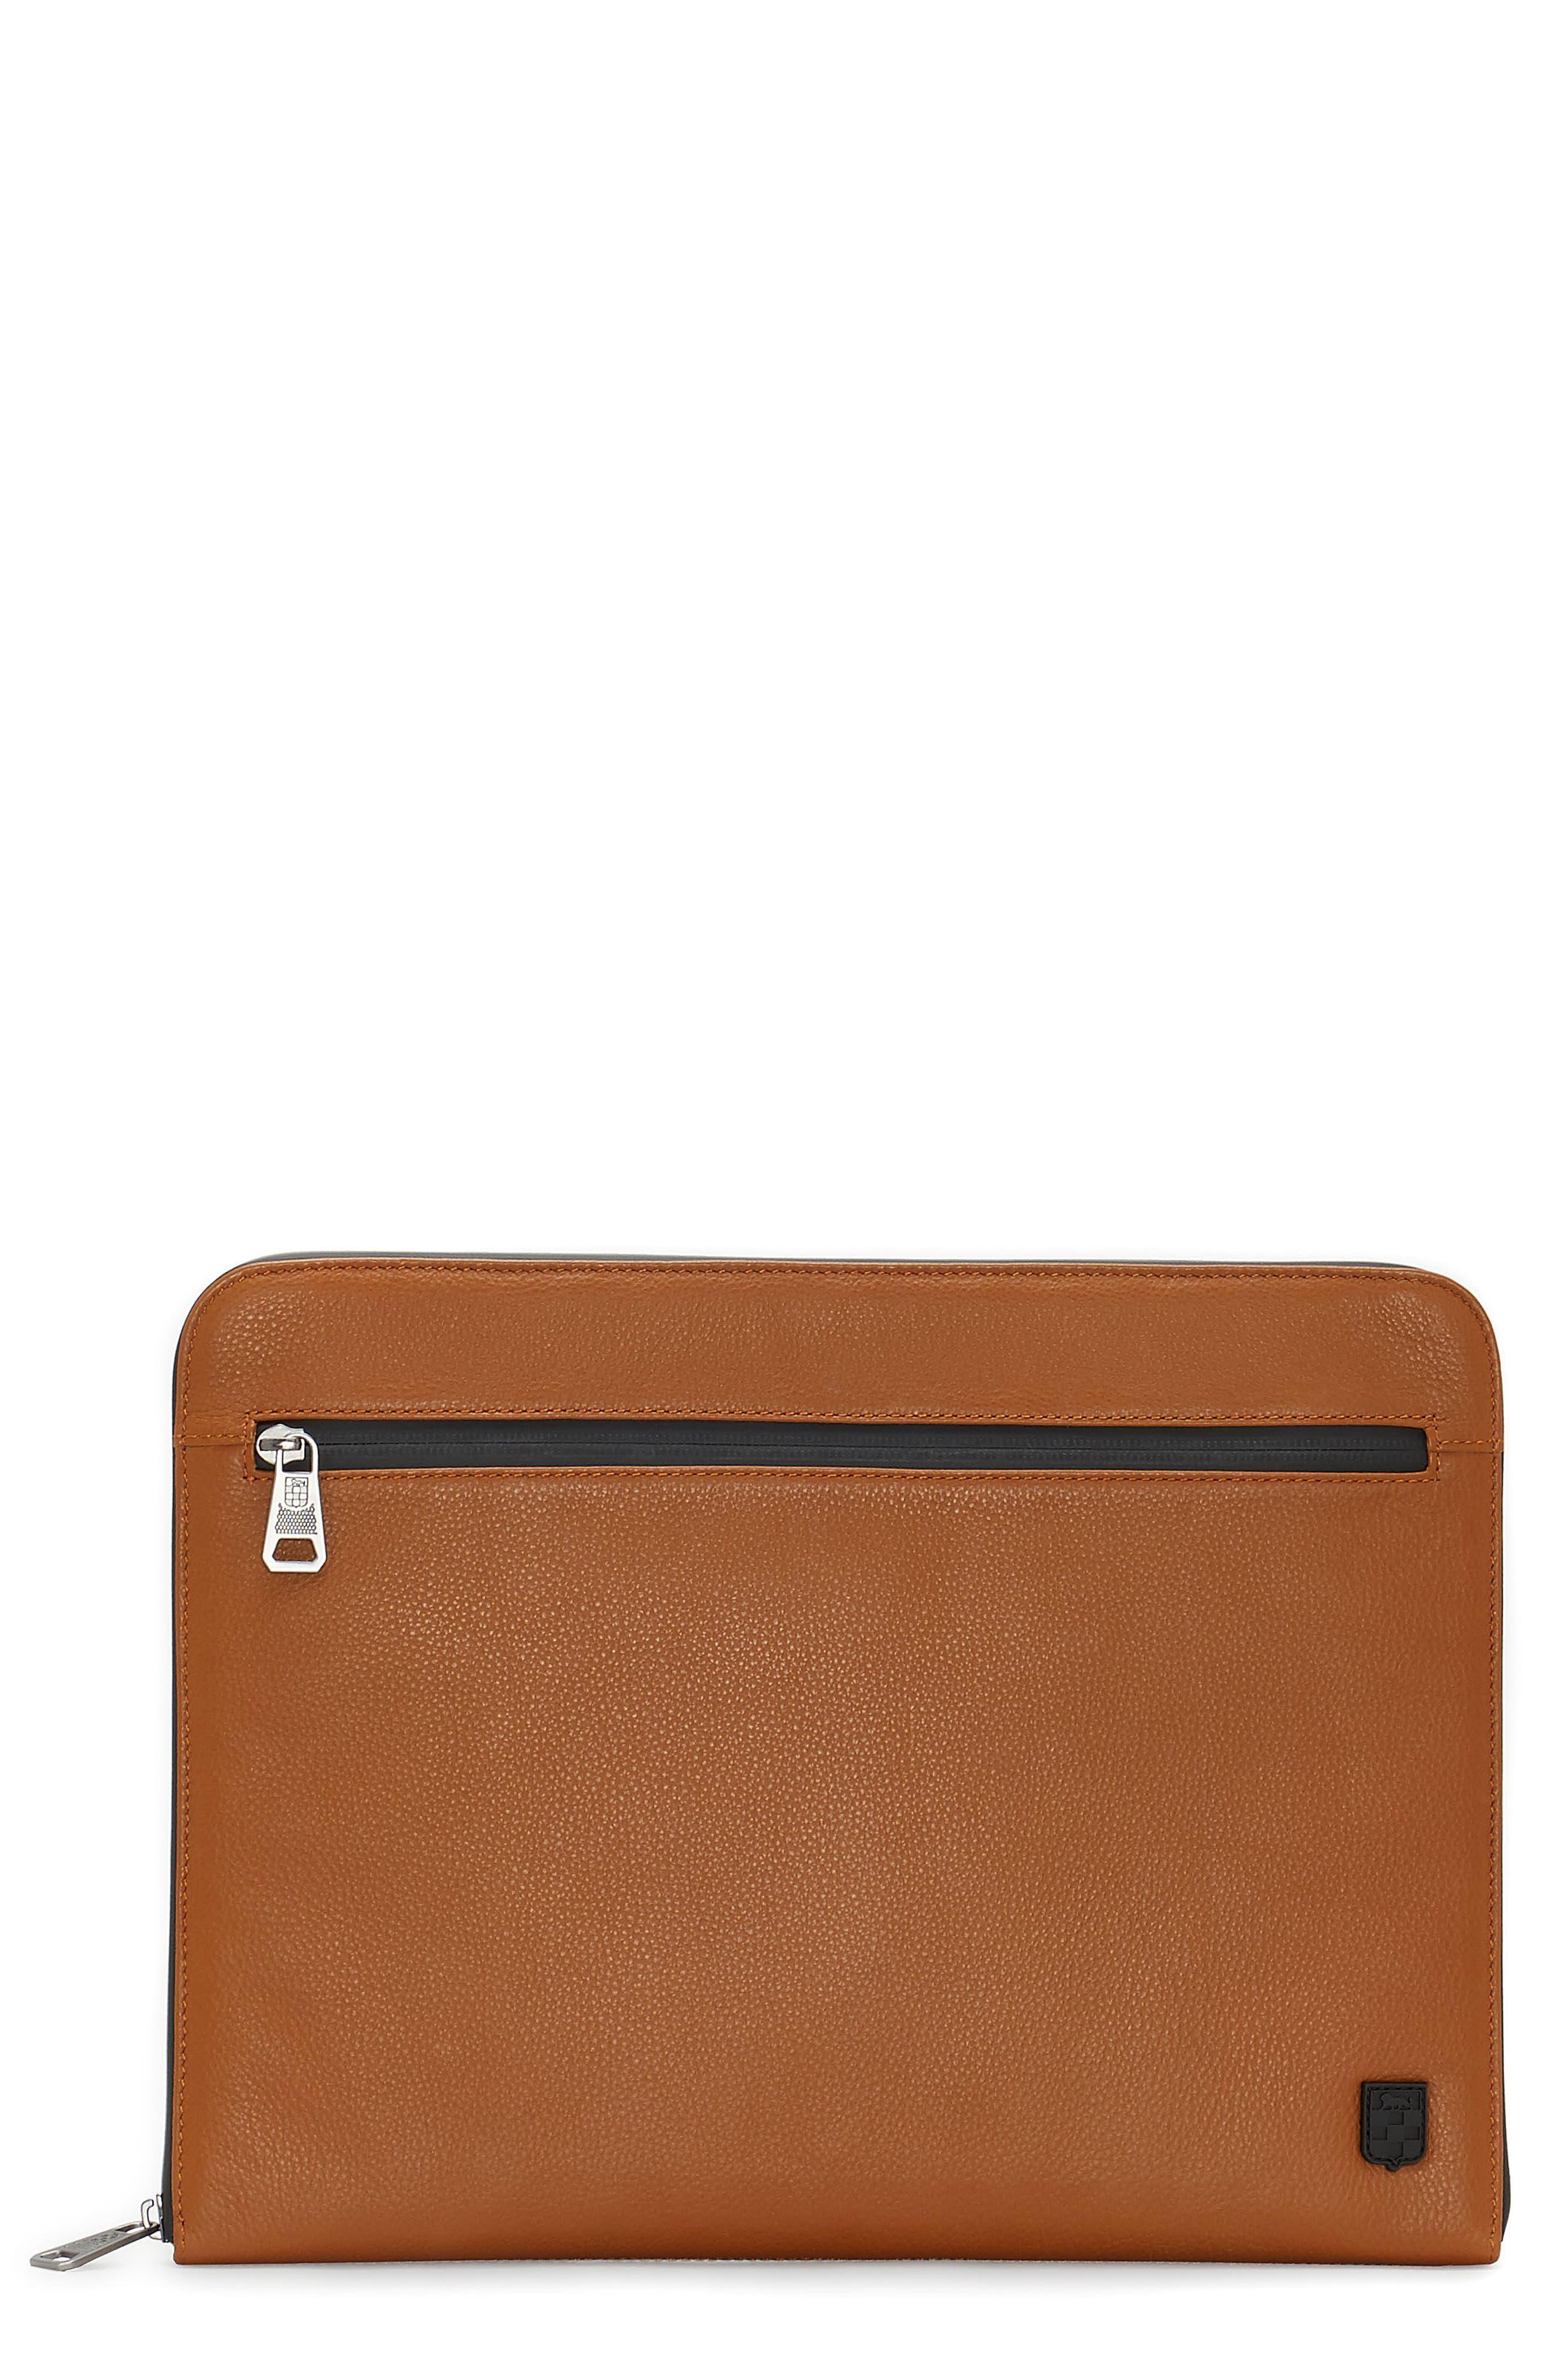 Purio Leather Portfolio,                         Main,                         color, 201